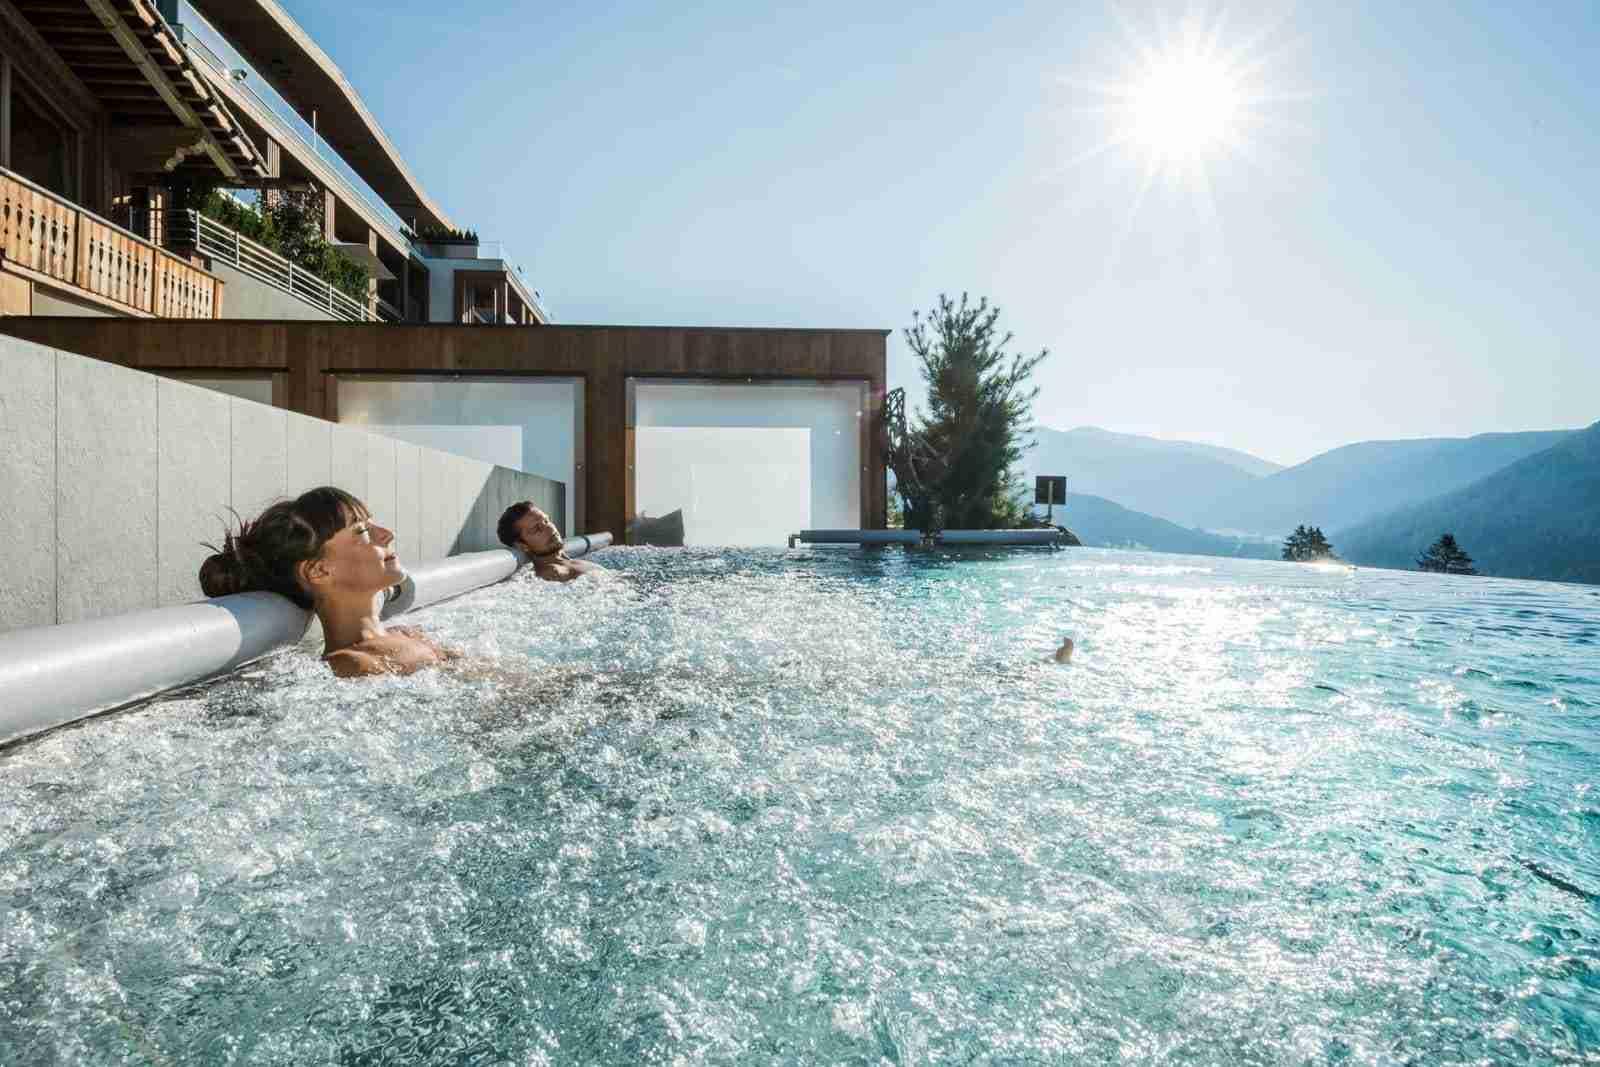 Hotel Alpen Tesitin Alto Adige